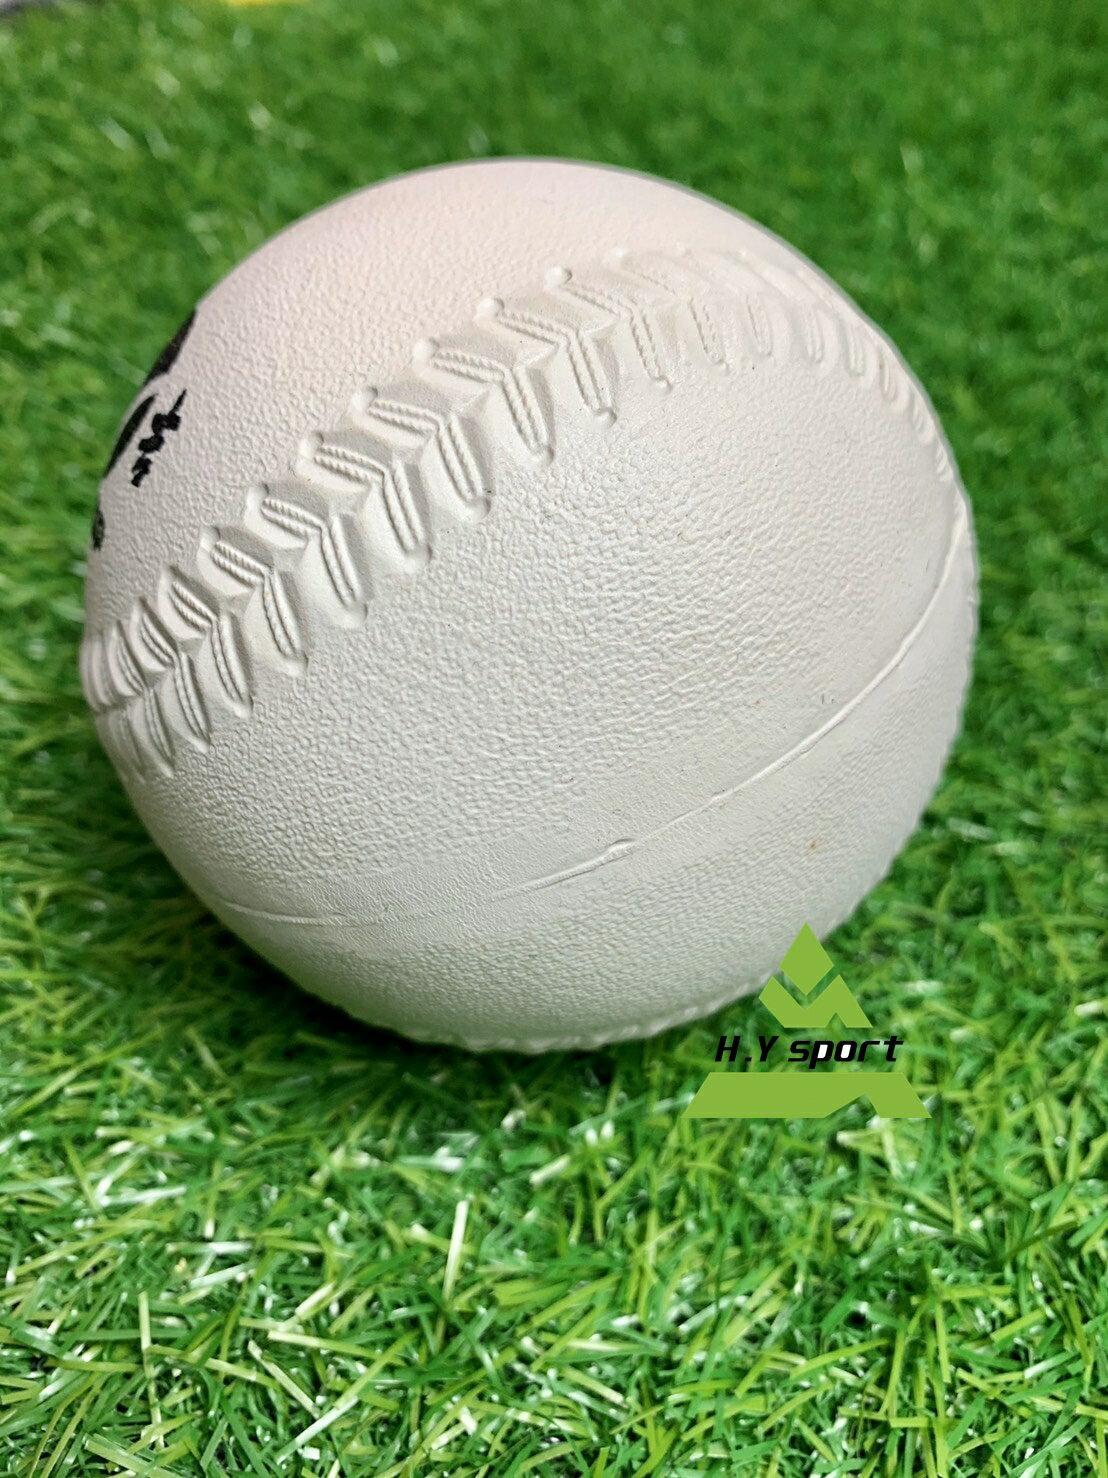 【H.Y SPORT】耐吉 YUTOP 練習壘球 白色 硬式壘球 1